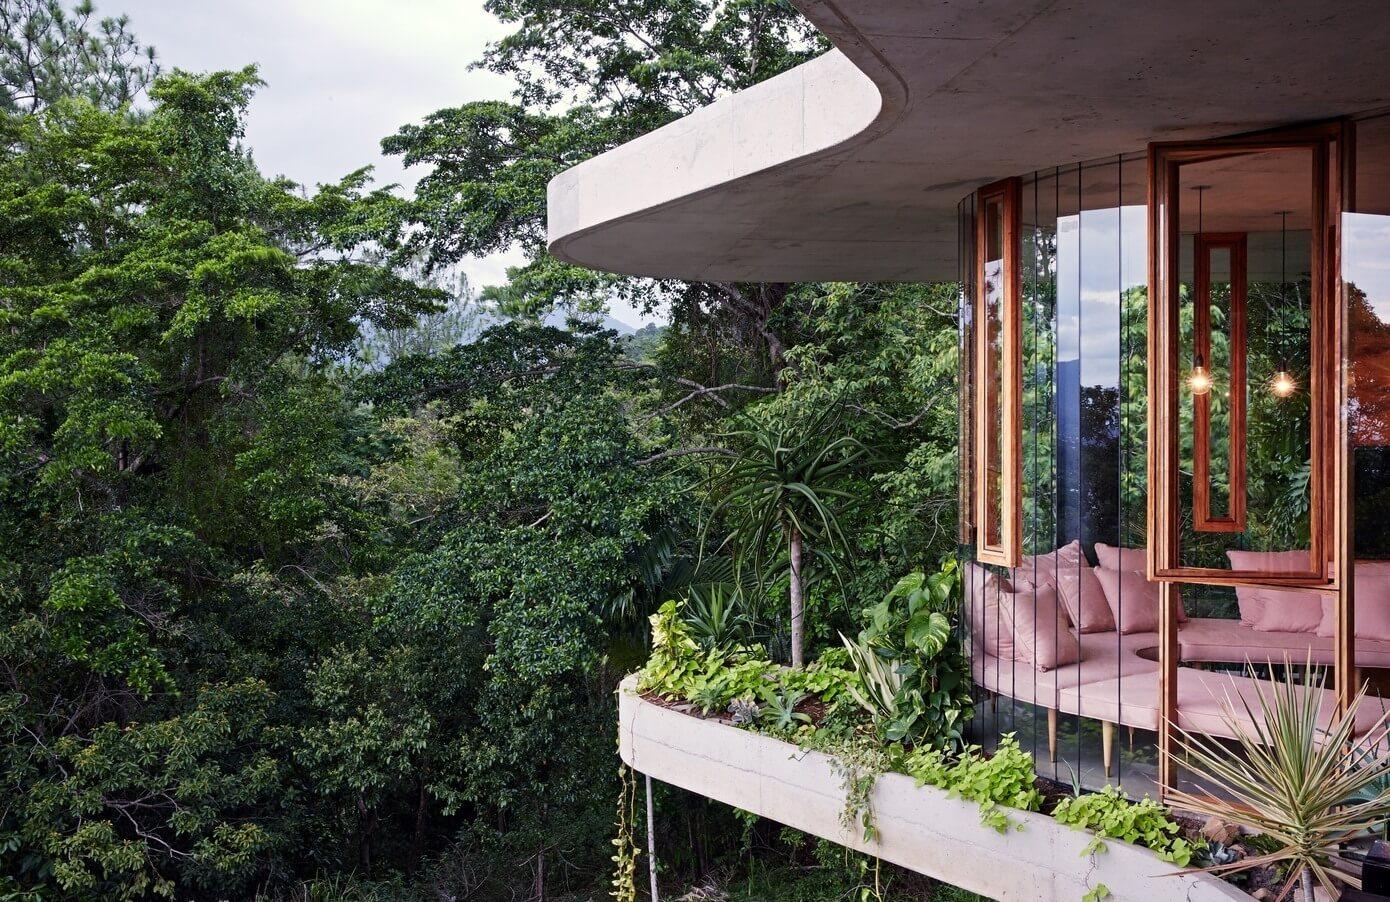 planchonella-house-jesse-bennett-architect-25